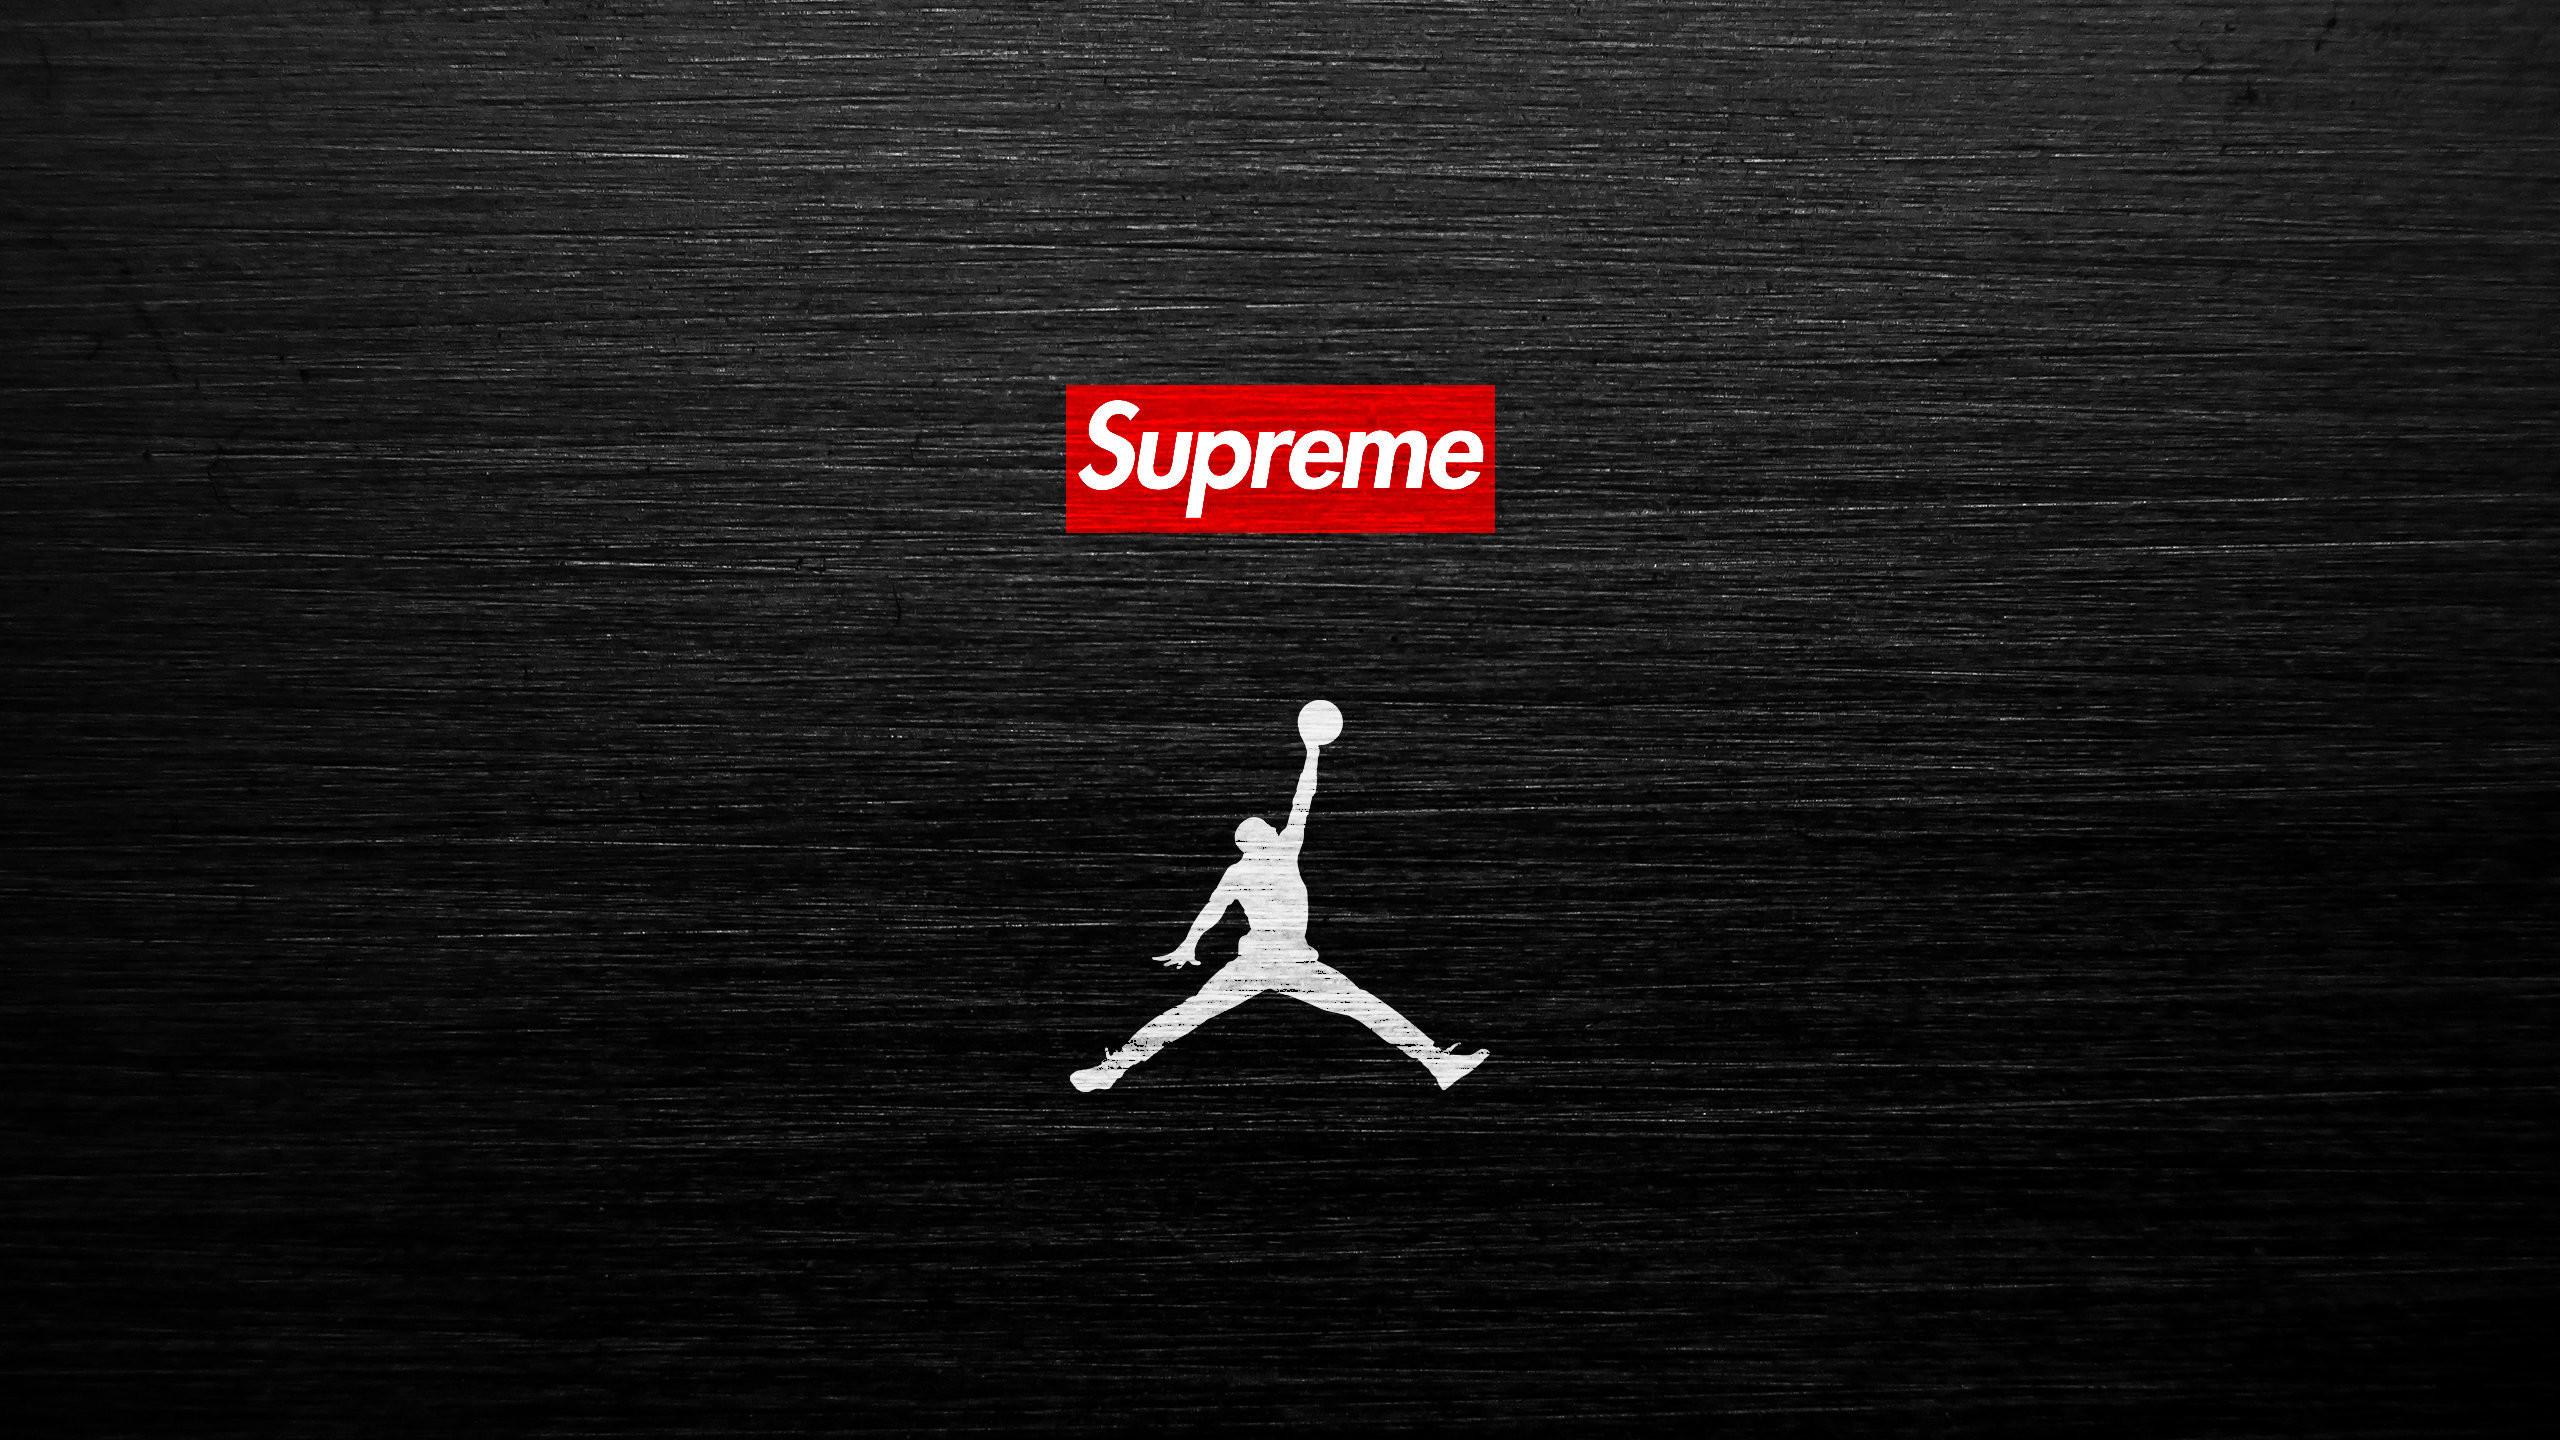 Jordan iPhone Wallpaper HD 74 images 2560x1440